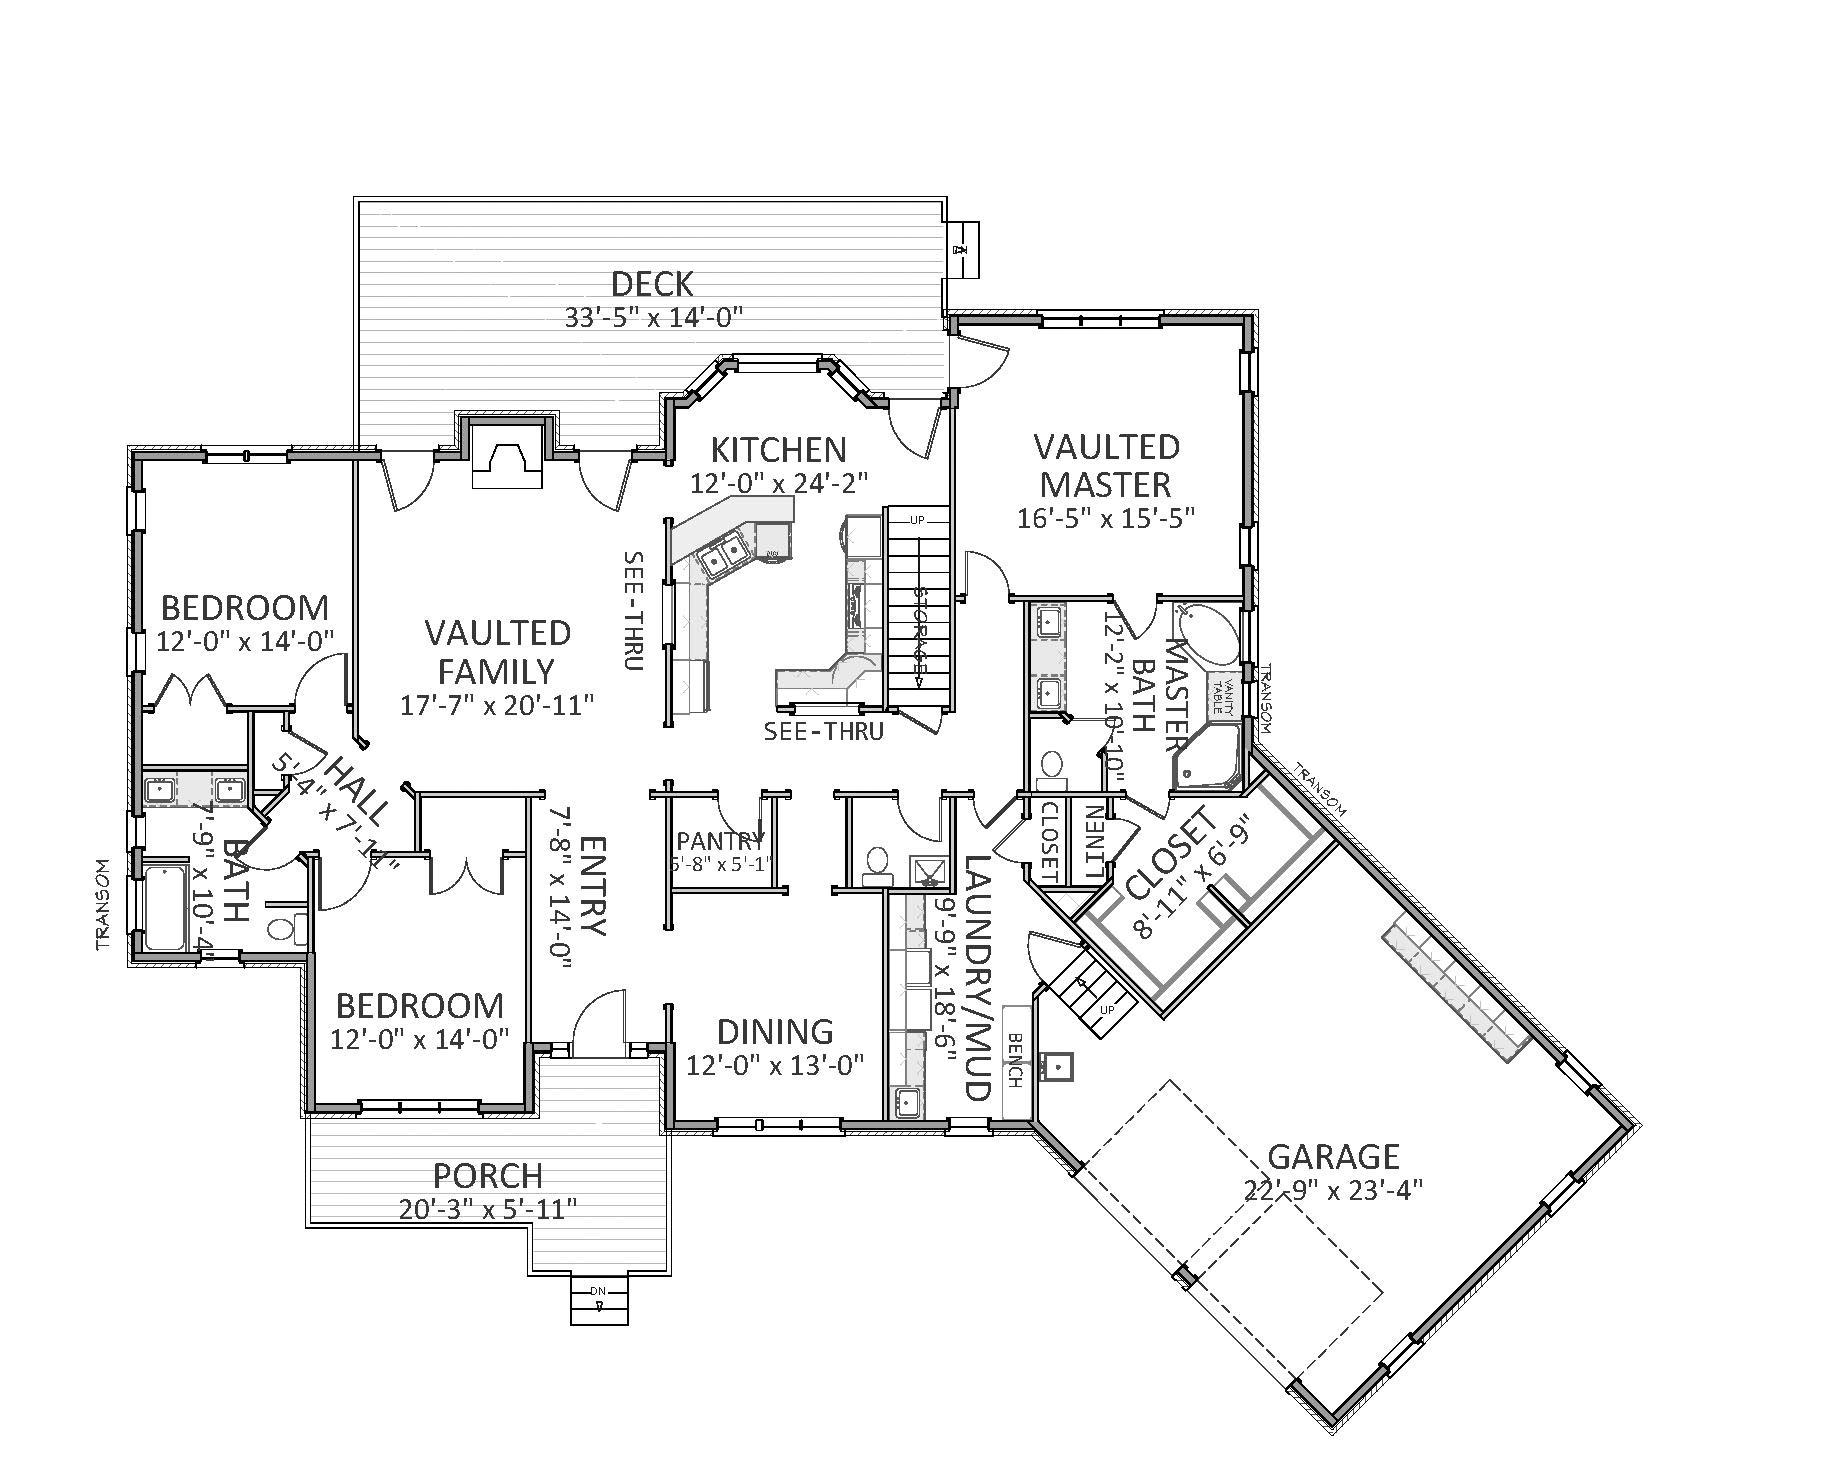 House Plan 189 3 Bdrm 2 549 Sq Ft Colonial Home